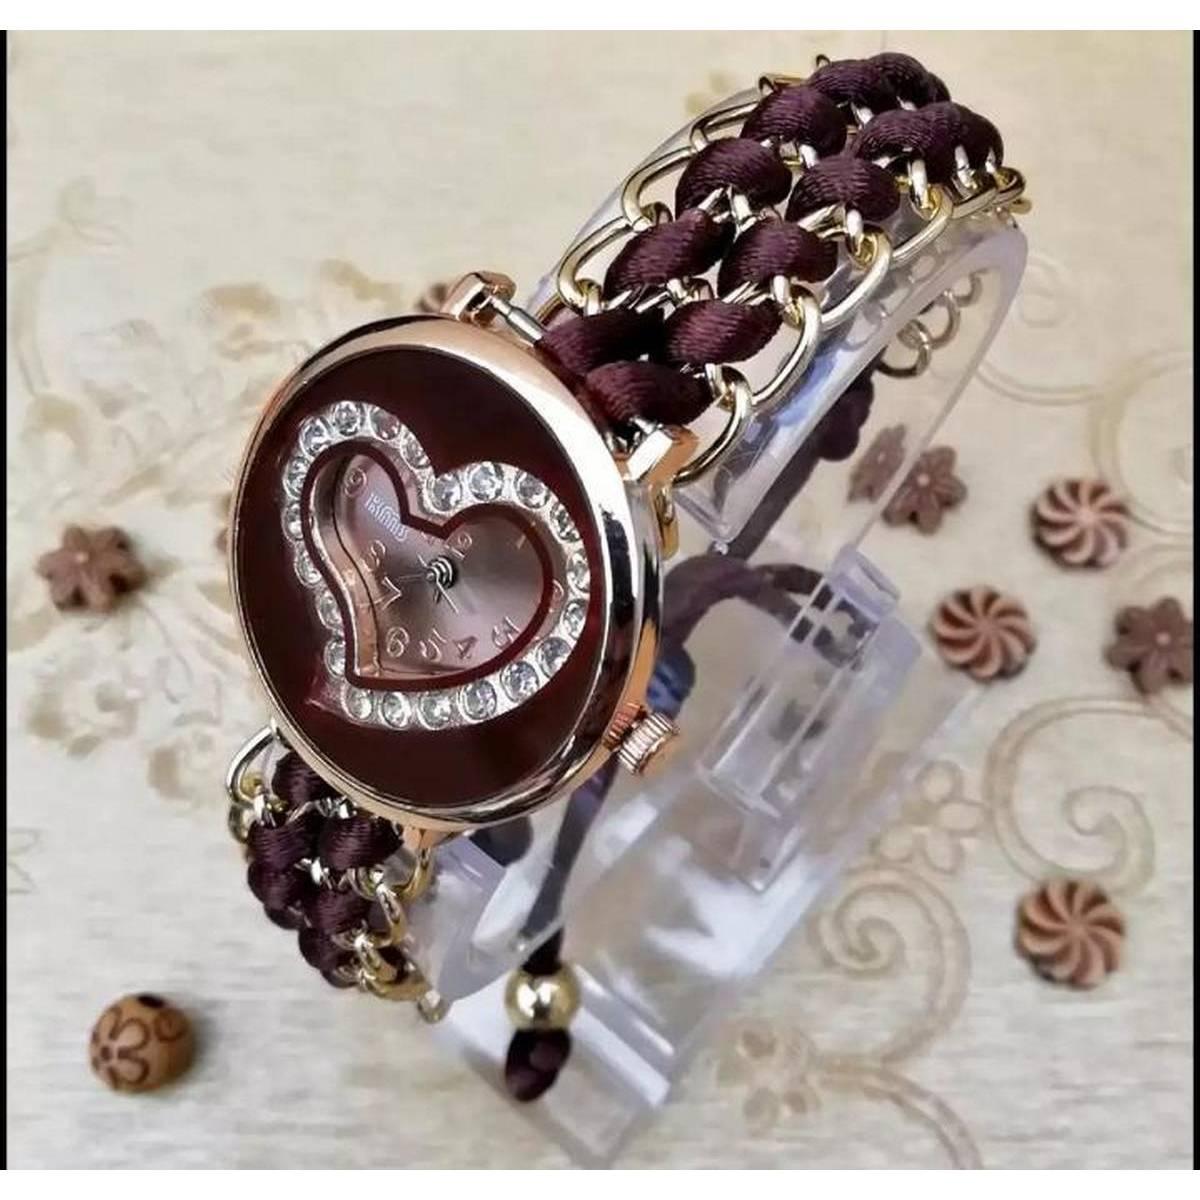 Hanmade Wrist Watch Floral Strap Electric Watch Analog Watch for Women Ladies Girls